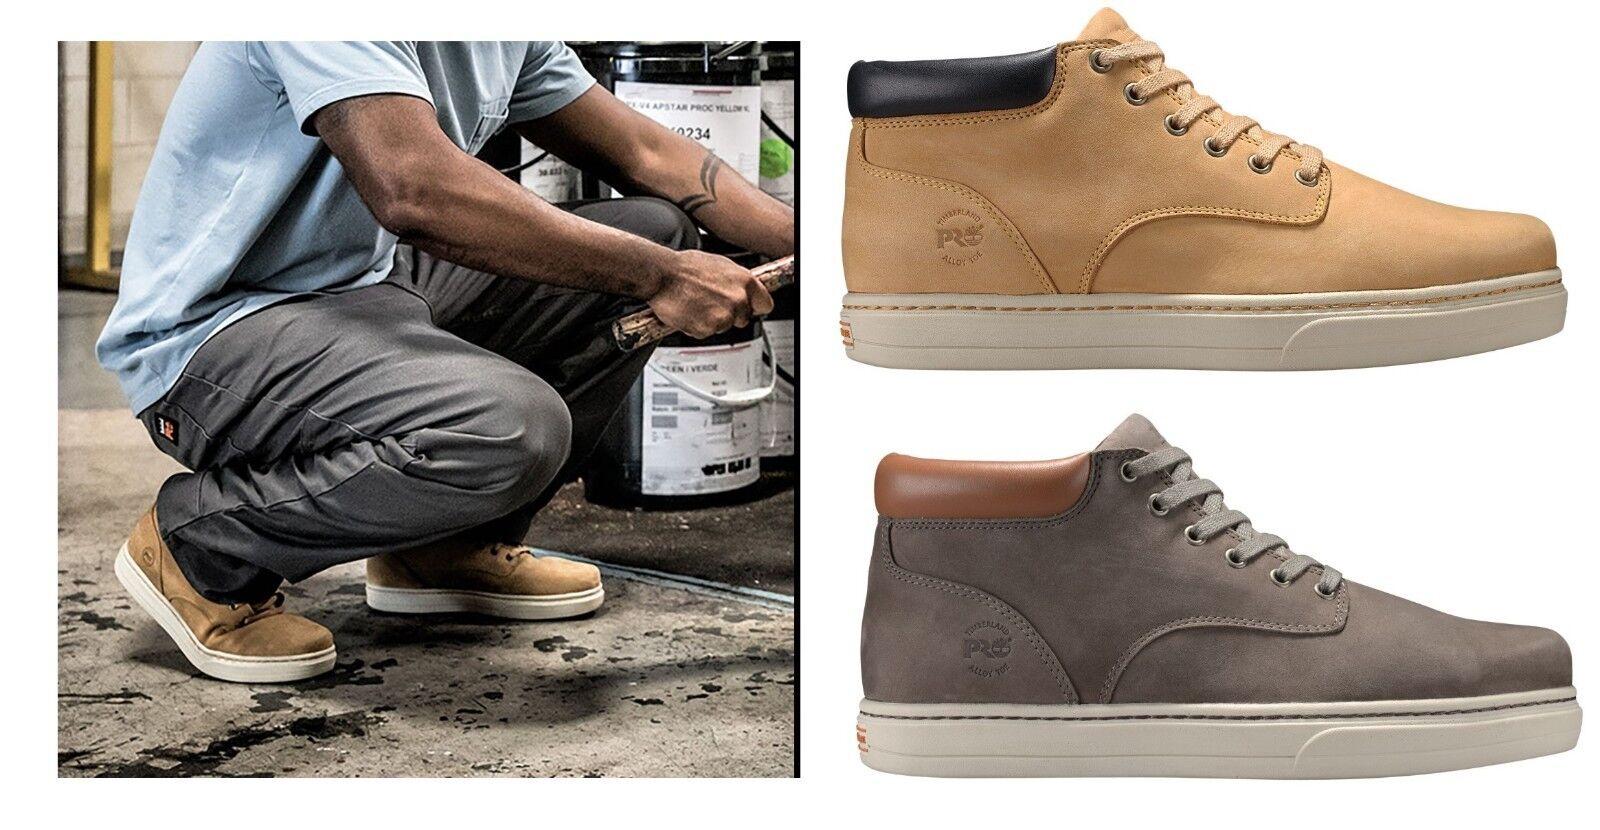 Timberland PRO Men's Boots Disruptor Mid Alloy Toe Chukka Work Boots WIDE Meduim